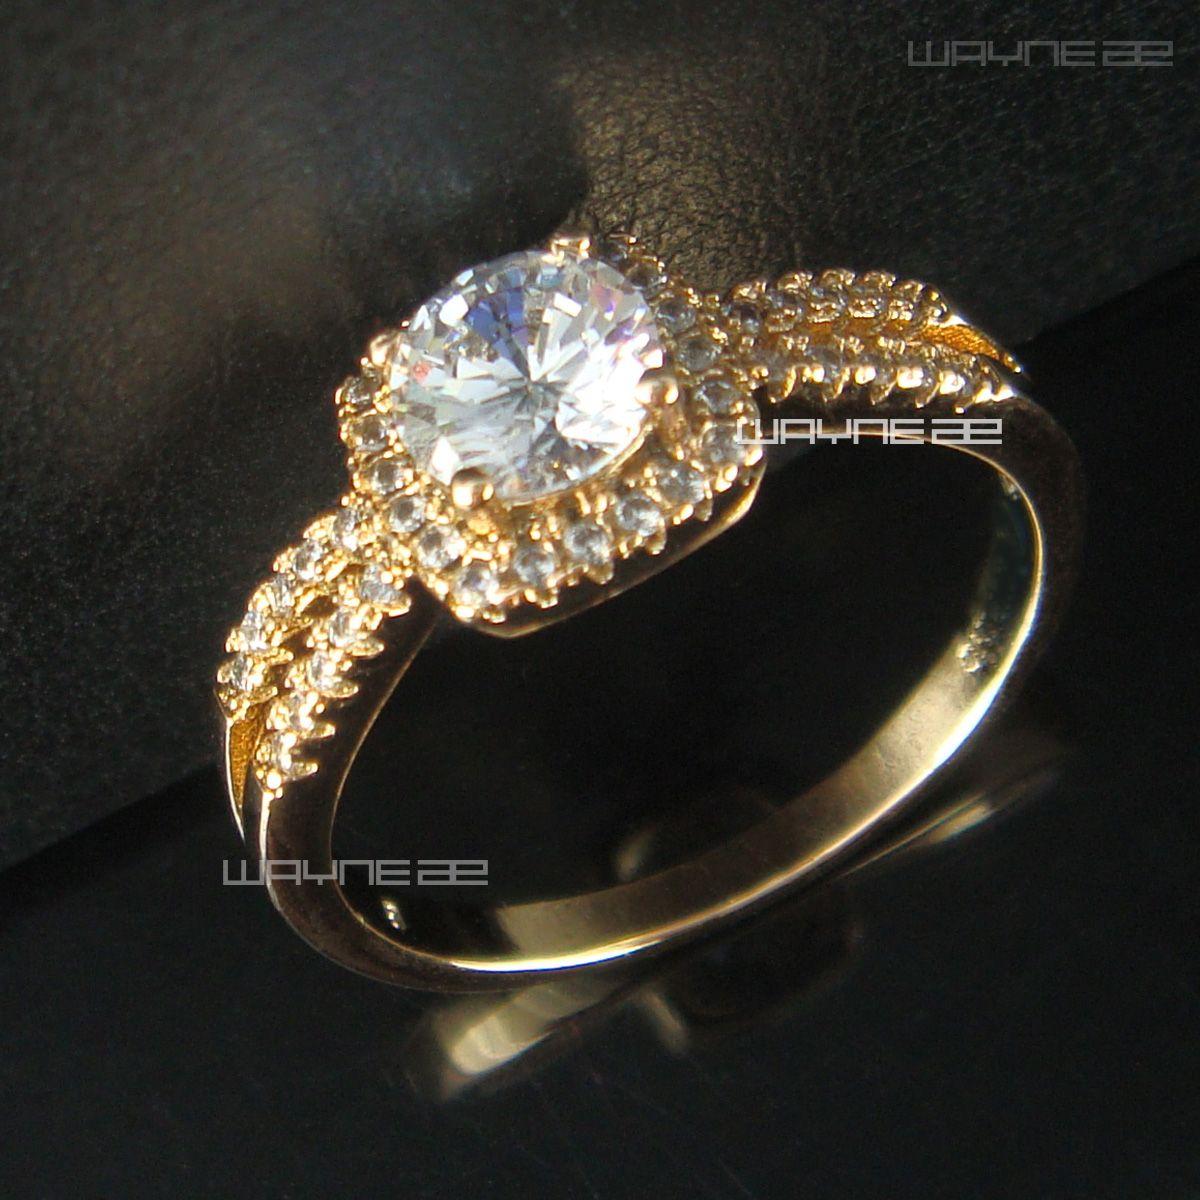 Ladies Elegant 18k Gold Filled cz Crystal Engagement Wedding Ring R185 Size6-8